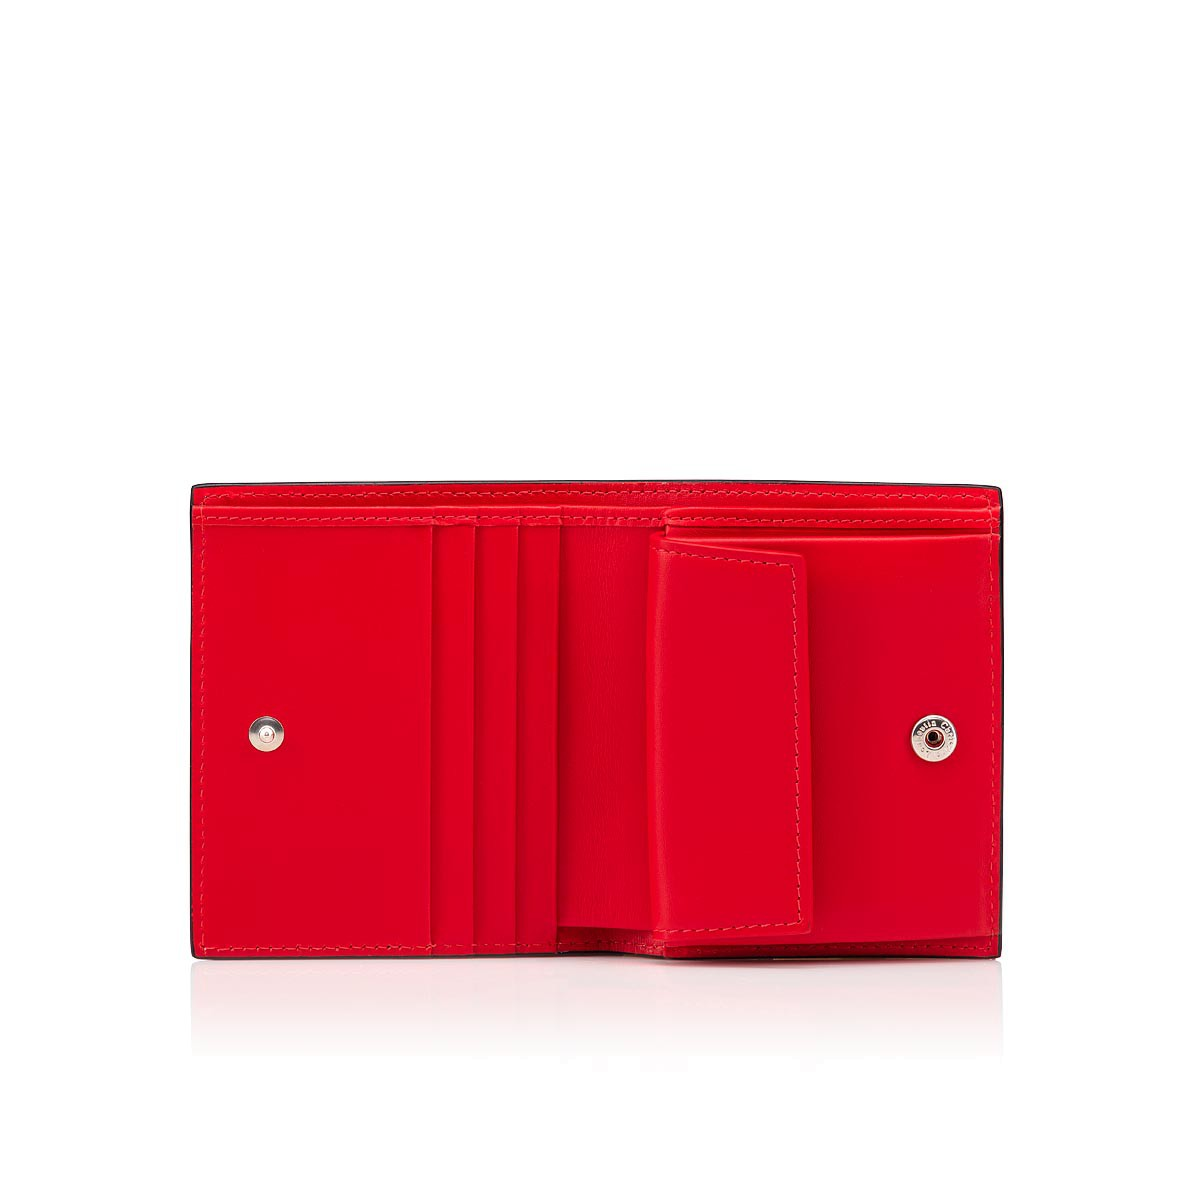 Small Leather Goods - W Palatin Wallet - Christian Louboutin